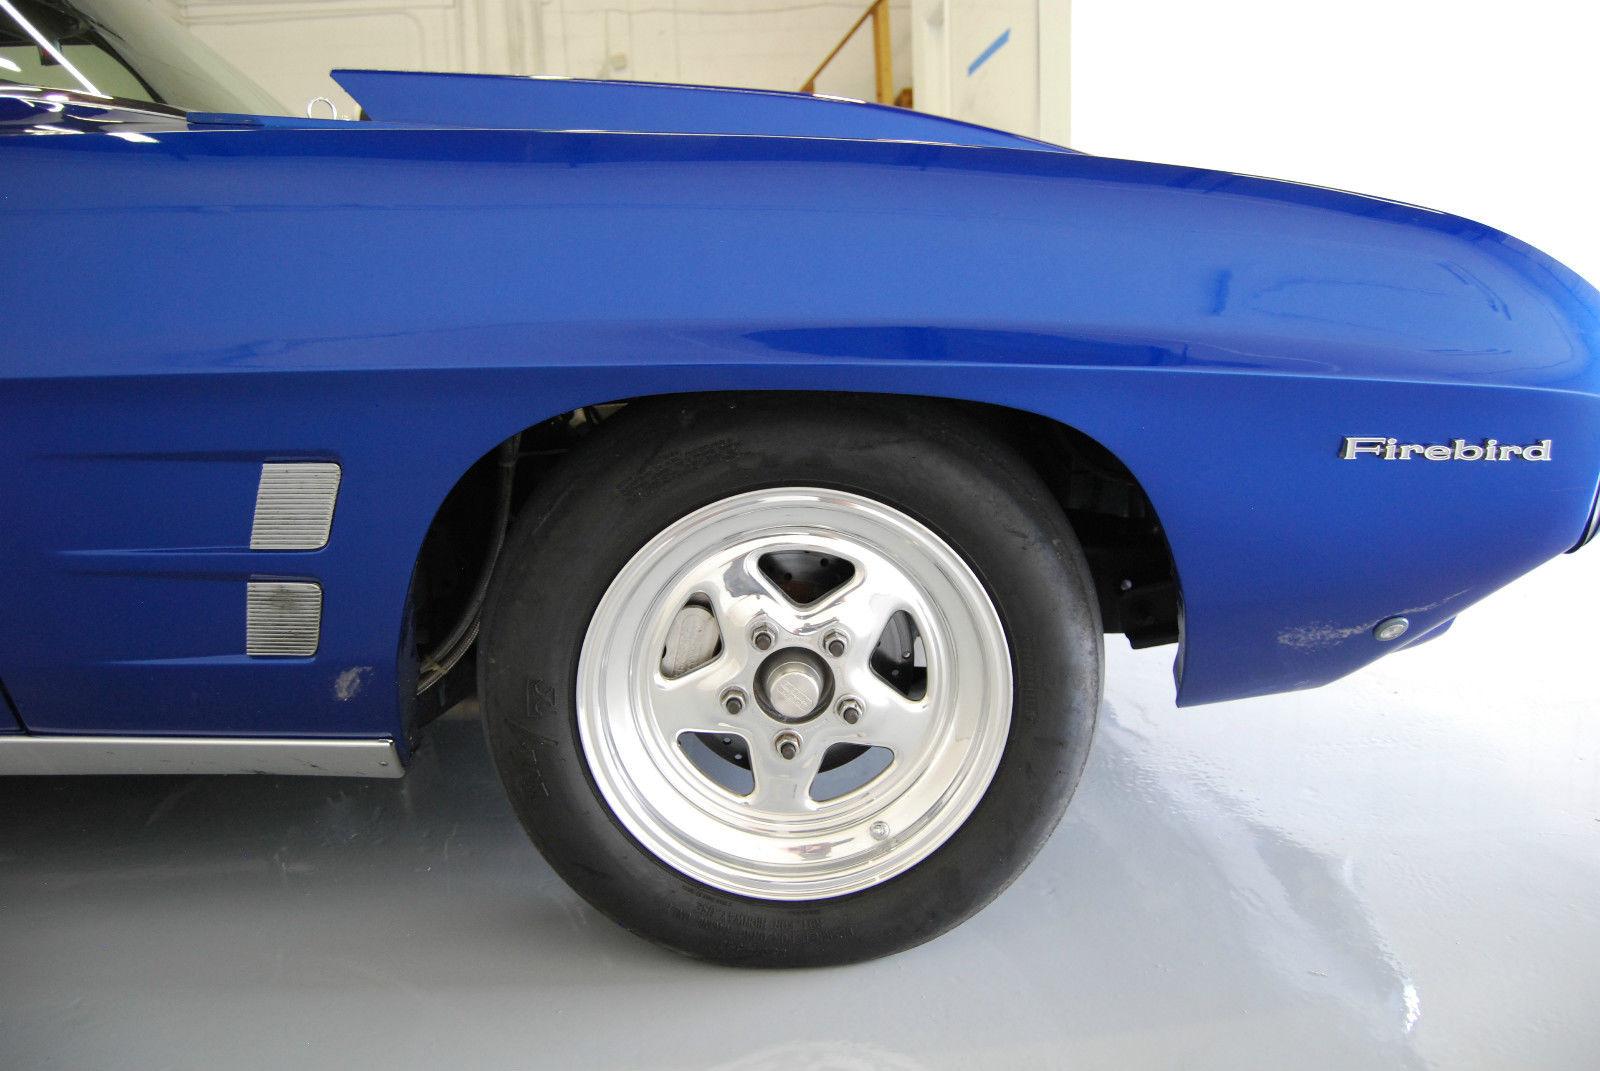 1969 Pontiac Firebird Pro Street Drag Car - Muscle Car